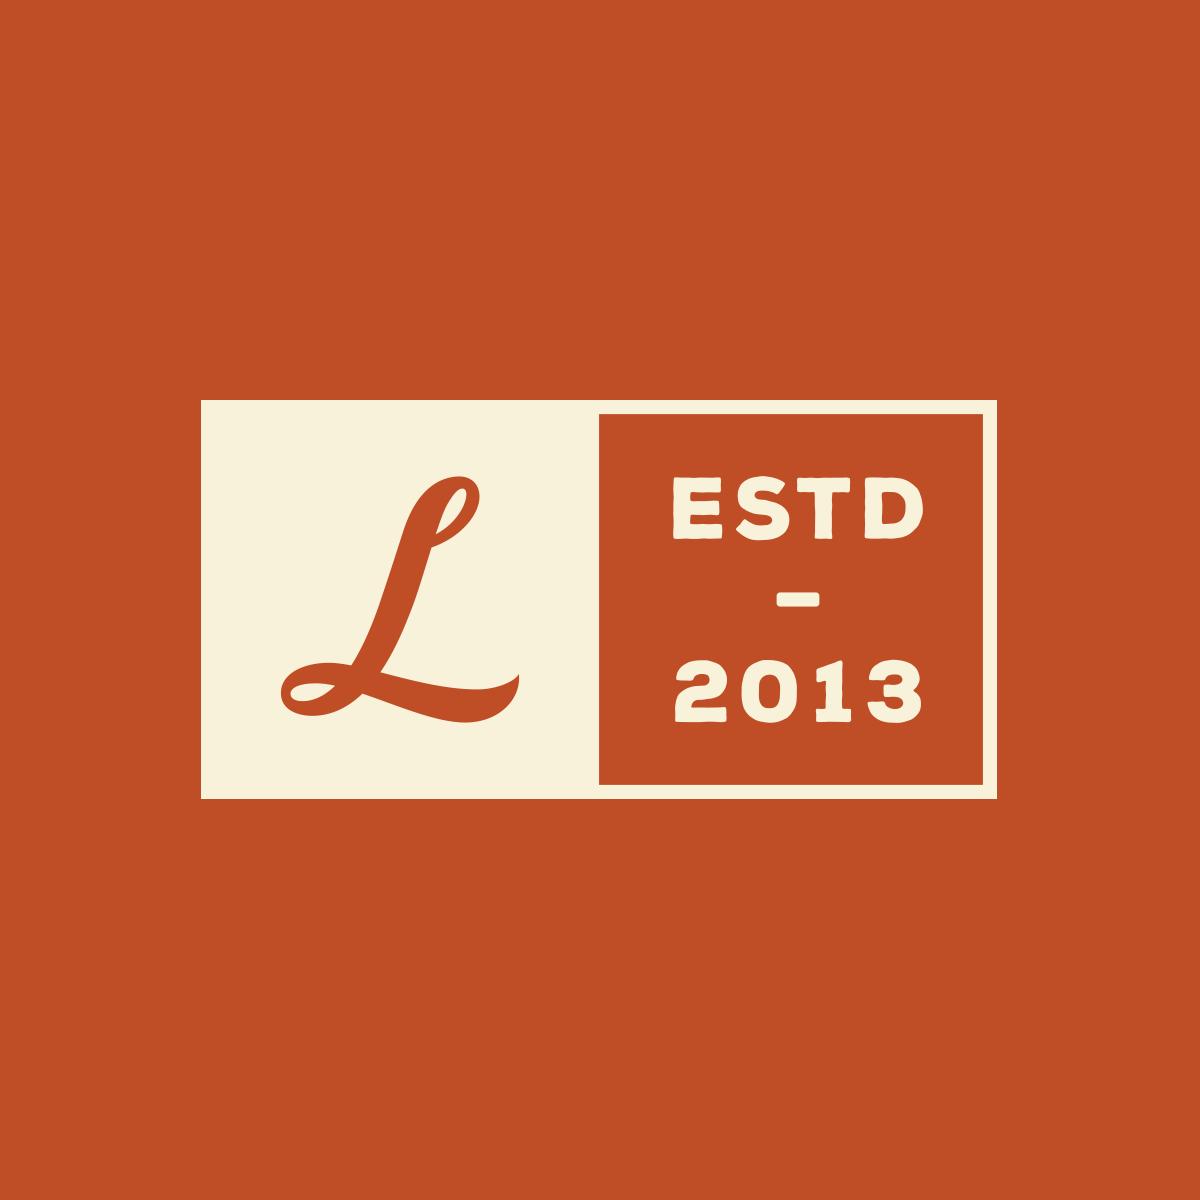 Lorenc Design on LogoLounge